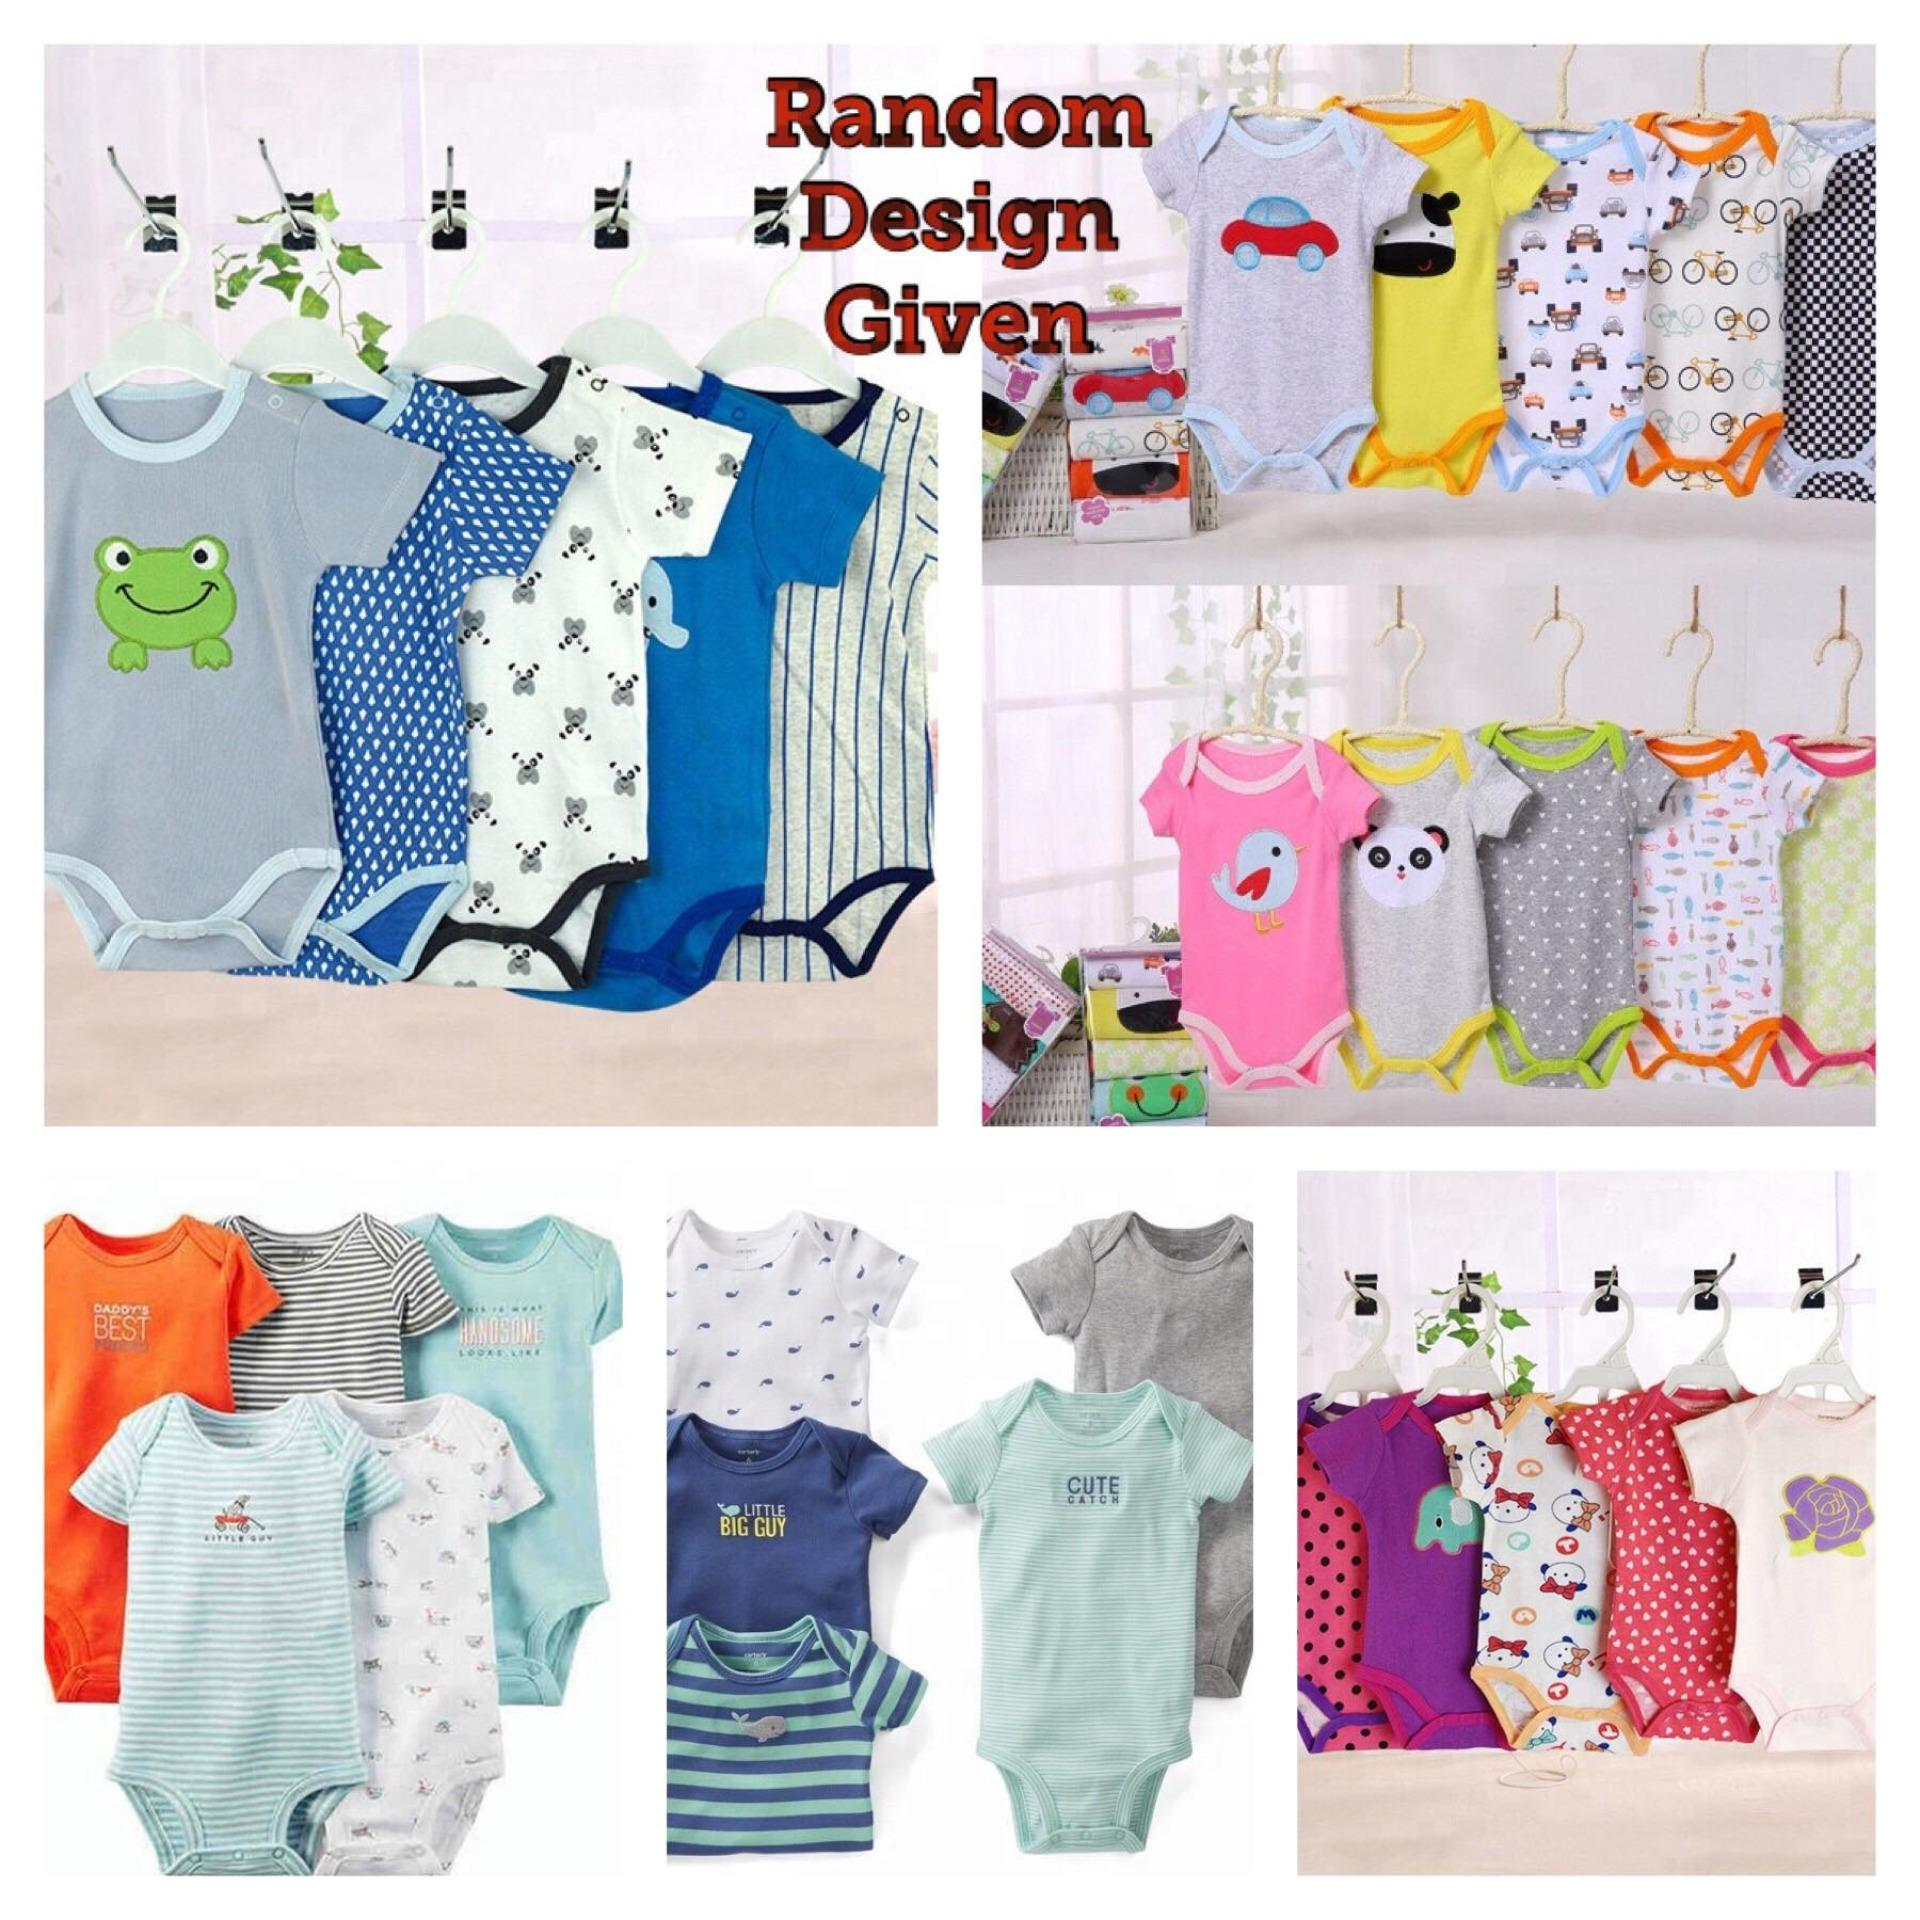 1a8664ce34 5 pcs Merdane Baby Romper Onesies Set - Babies Clothes Girls and Boys Short  Sleeve Onesie